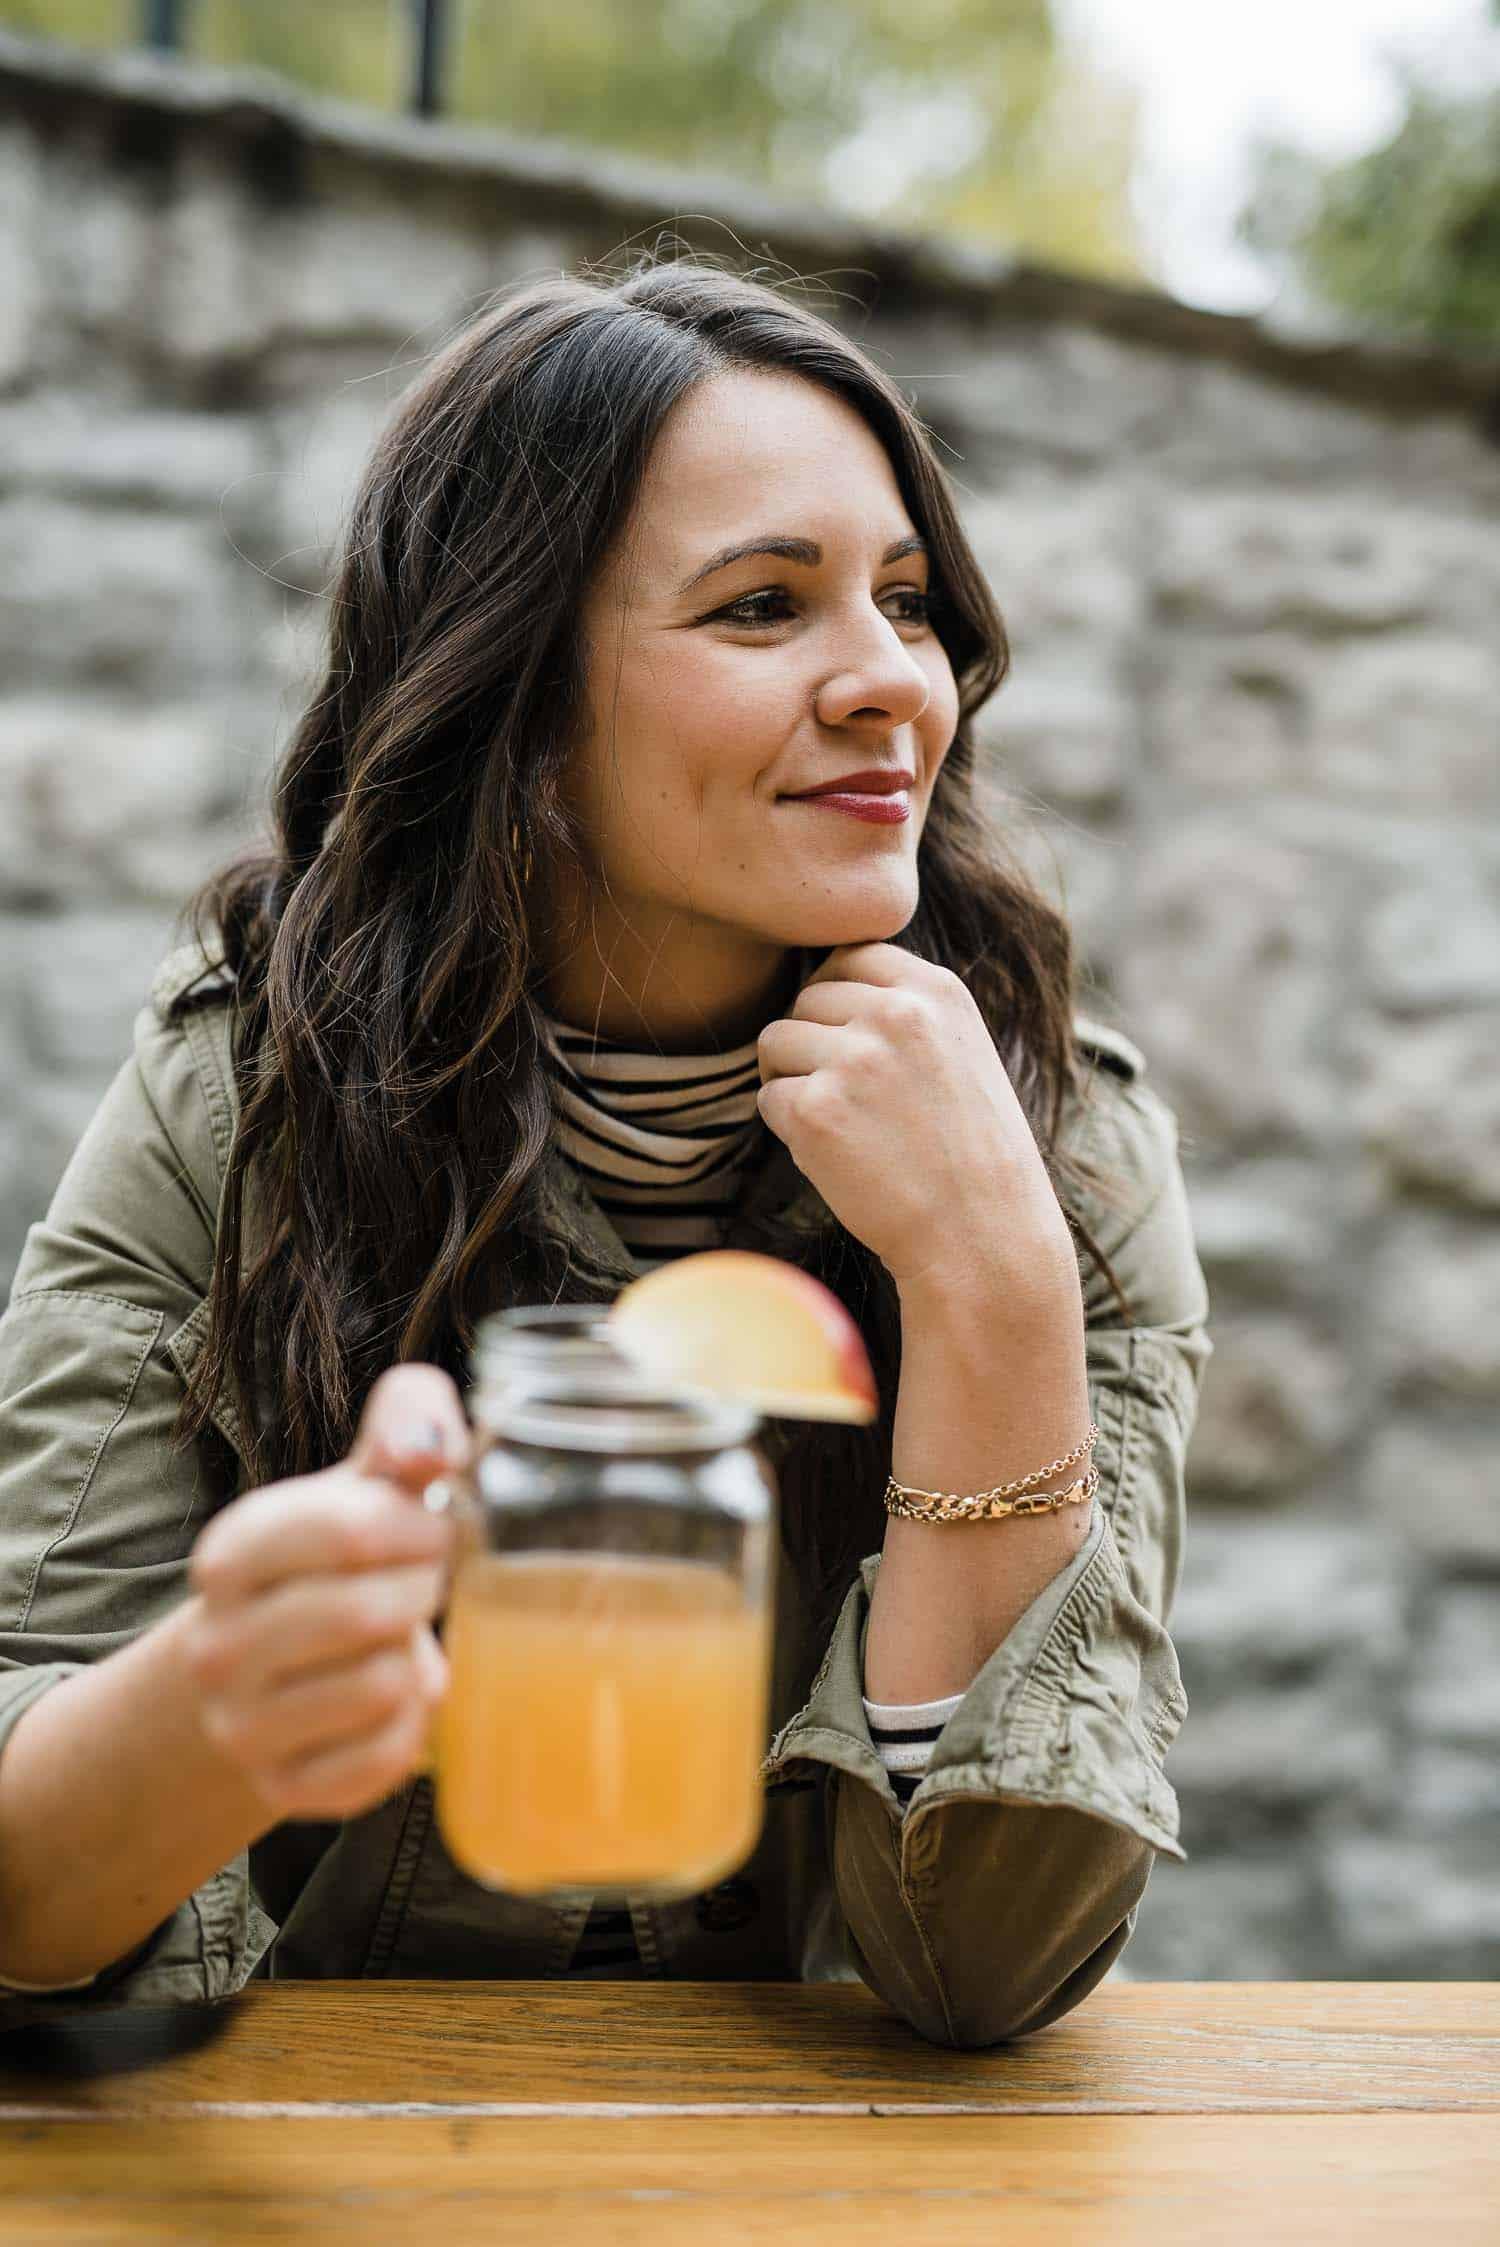 My Maple Bourbon Apple Cider Recipe - My Style Vita